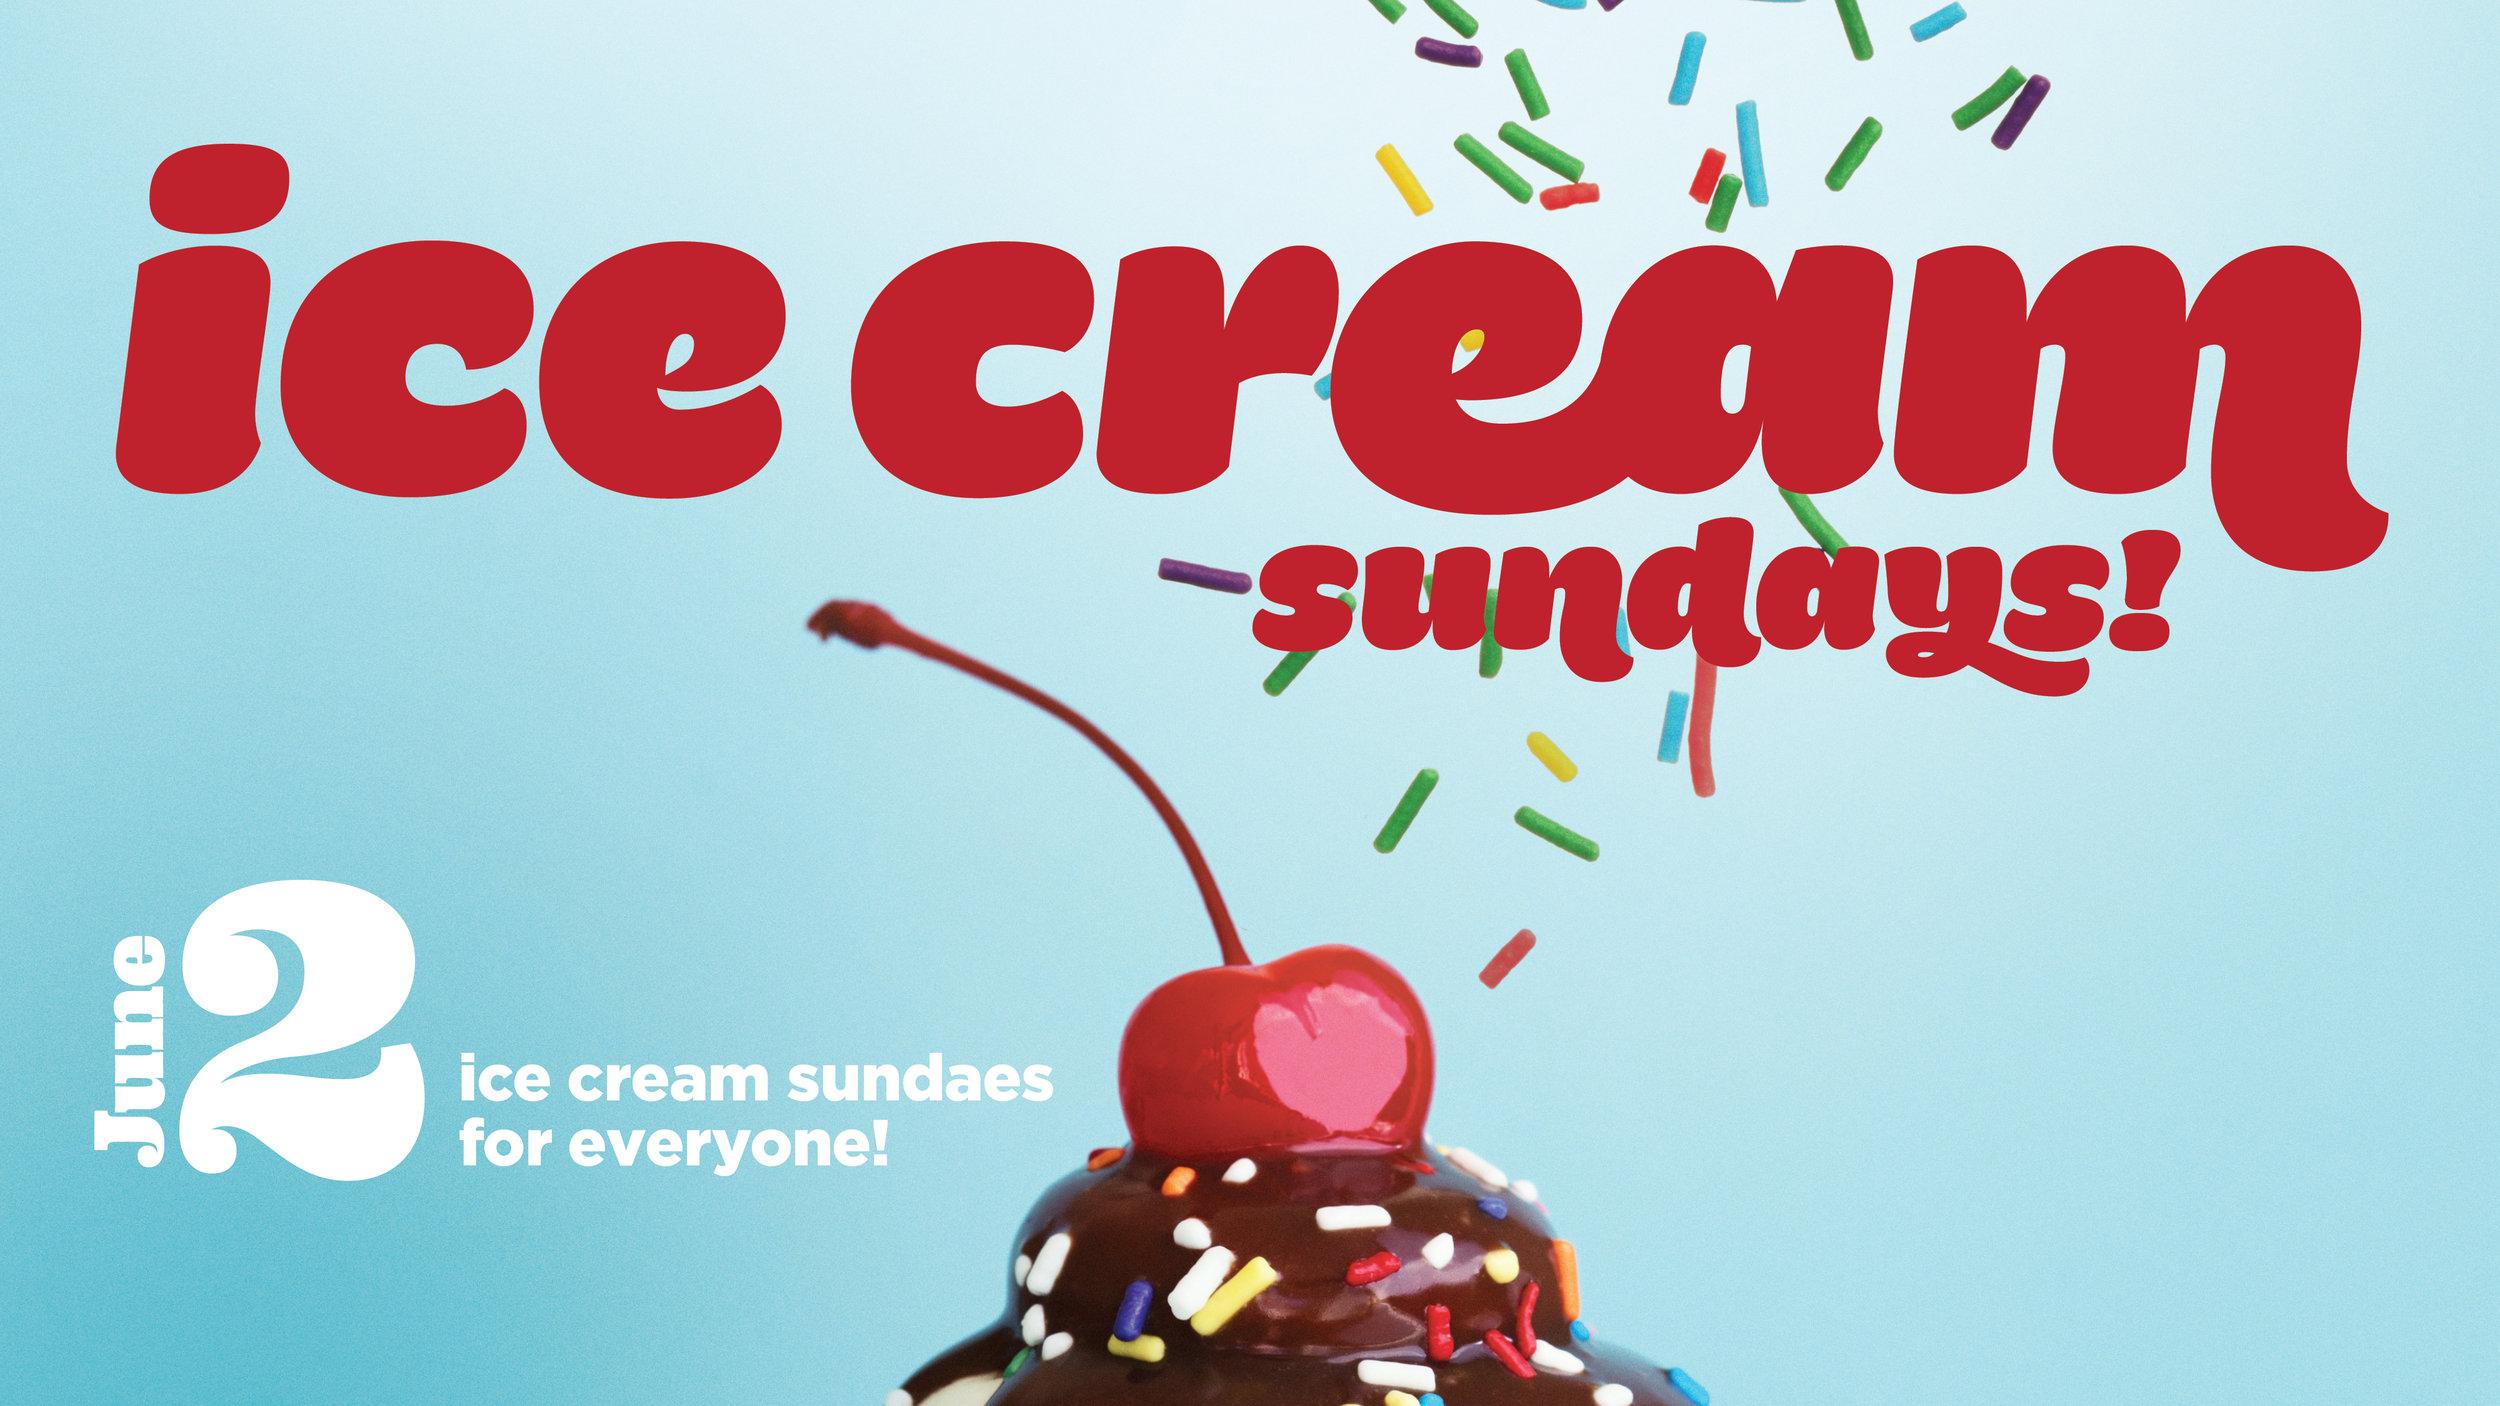 Ice Cream Sunday_web-graphic_1920x1080_01.jpg